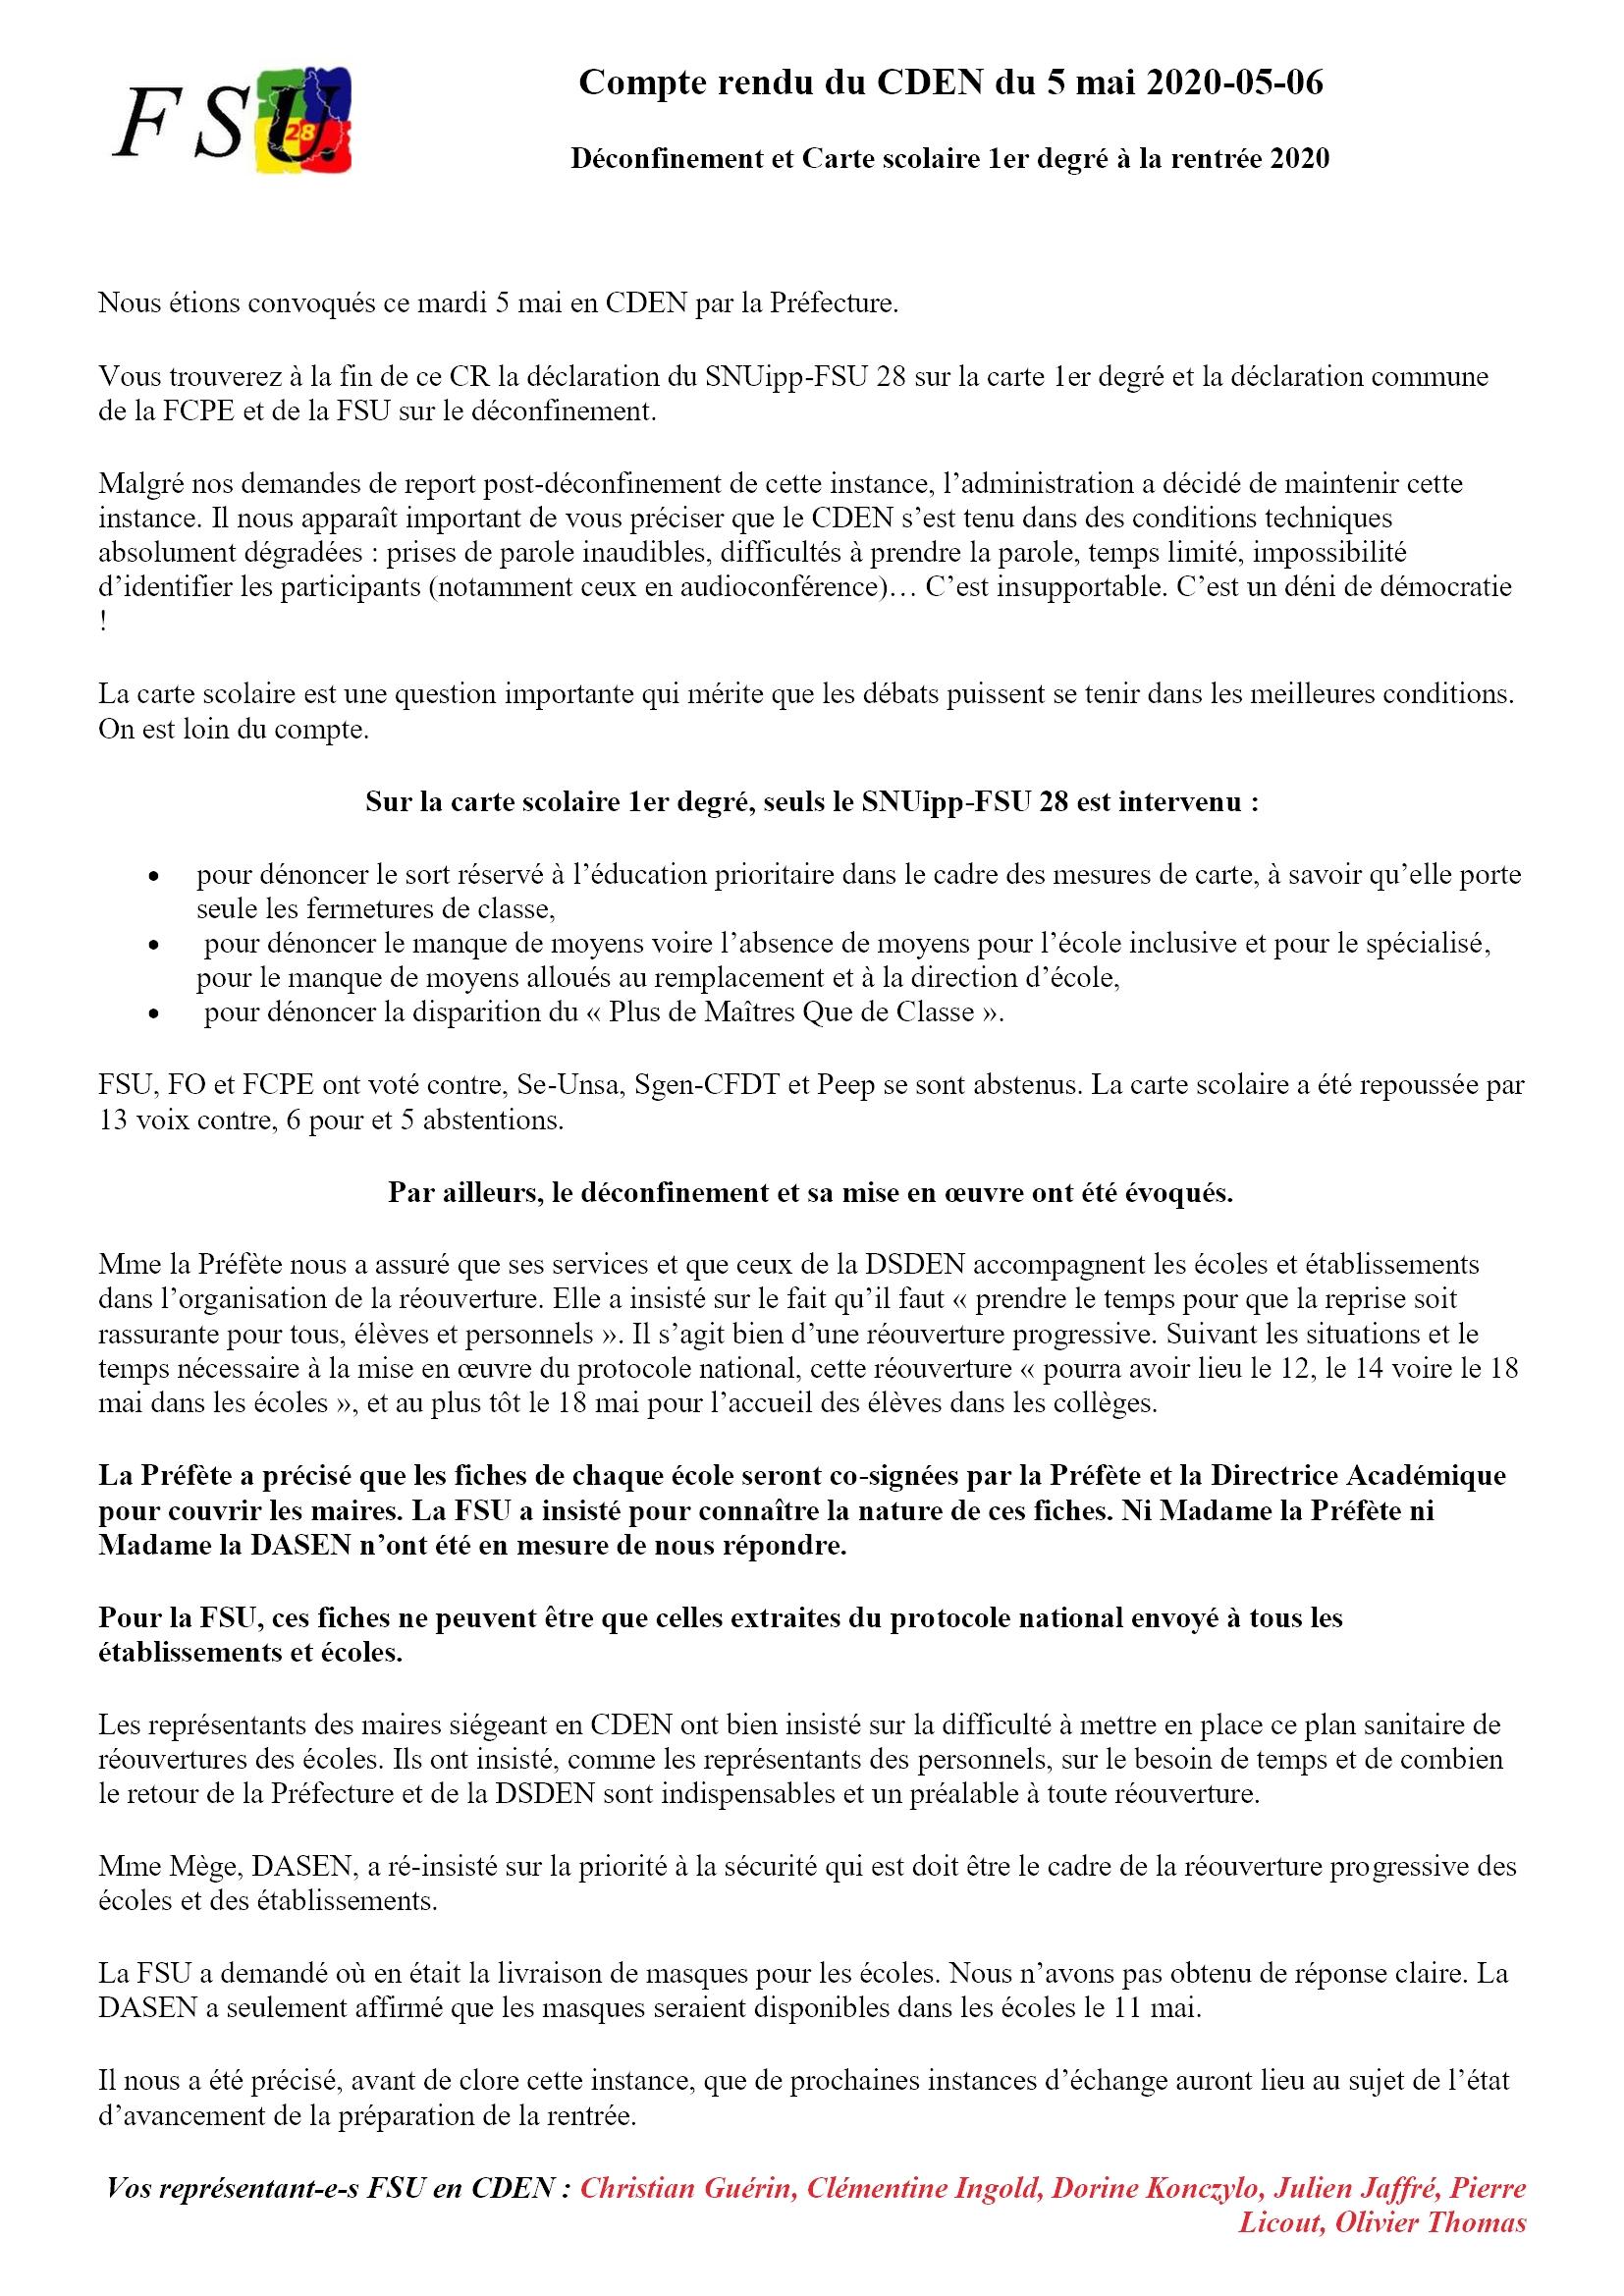 FSU 28 Compte rendu du CDEN du 5 mai 2020